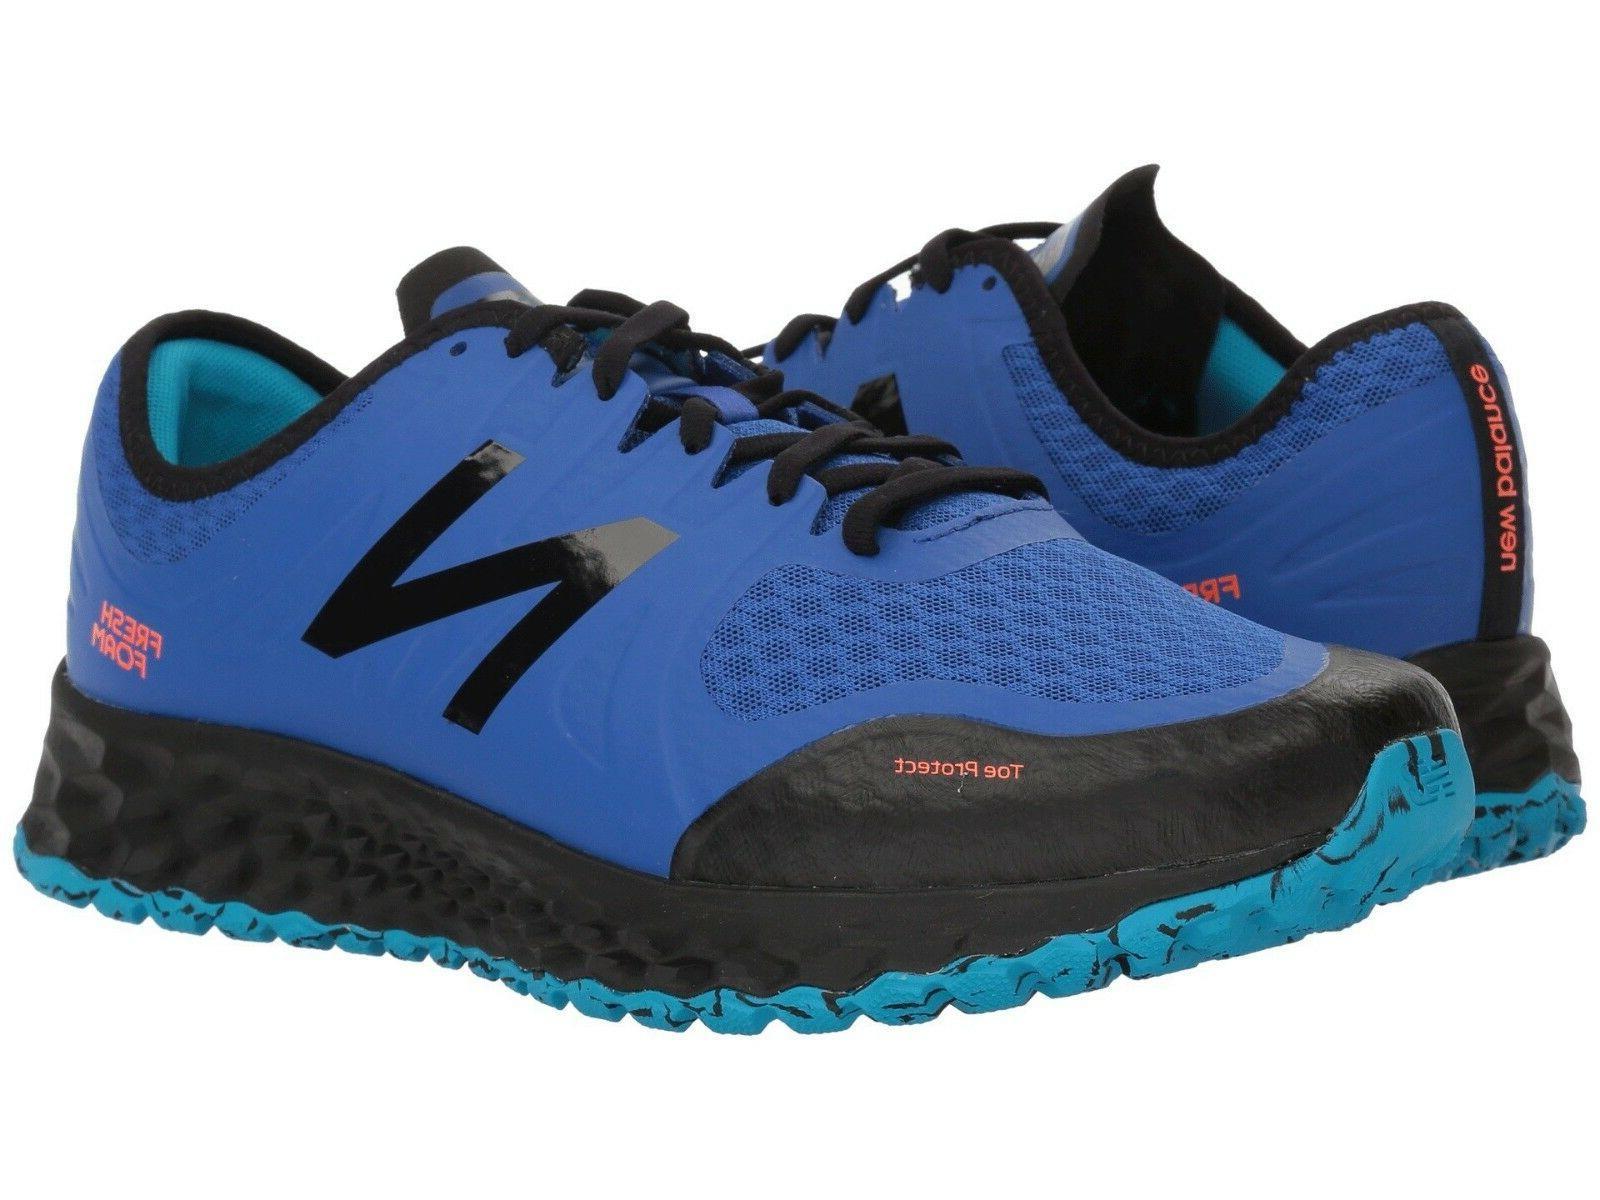 nib kaymin men s trail running shoes